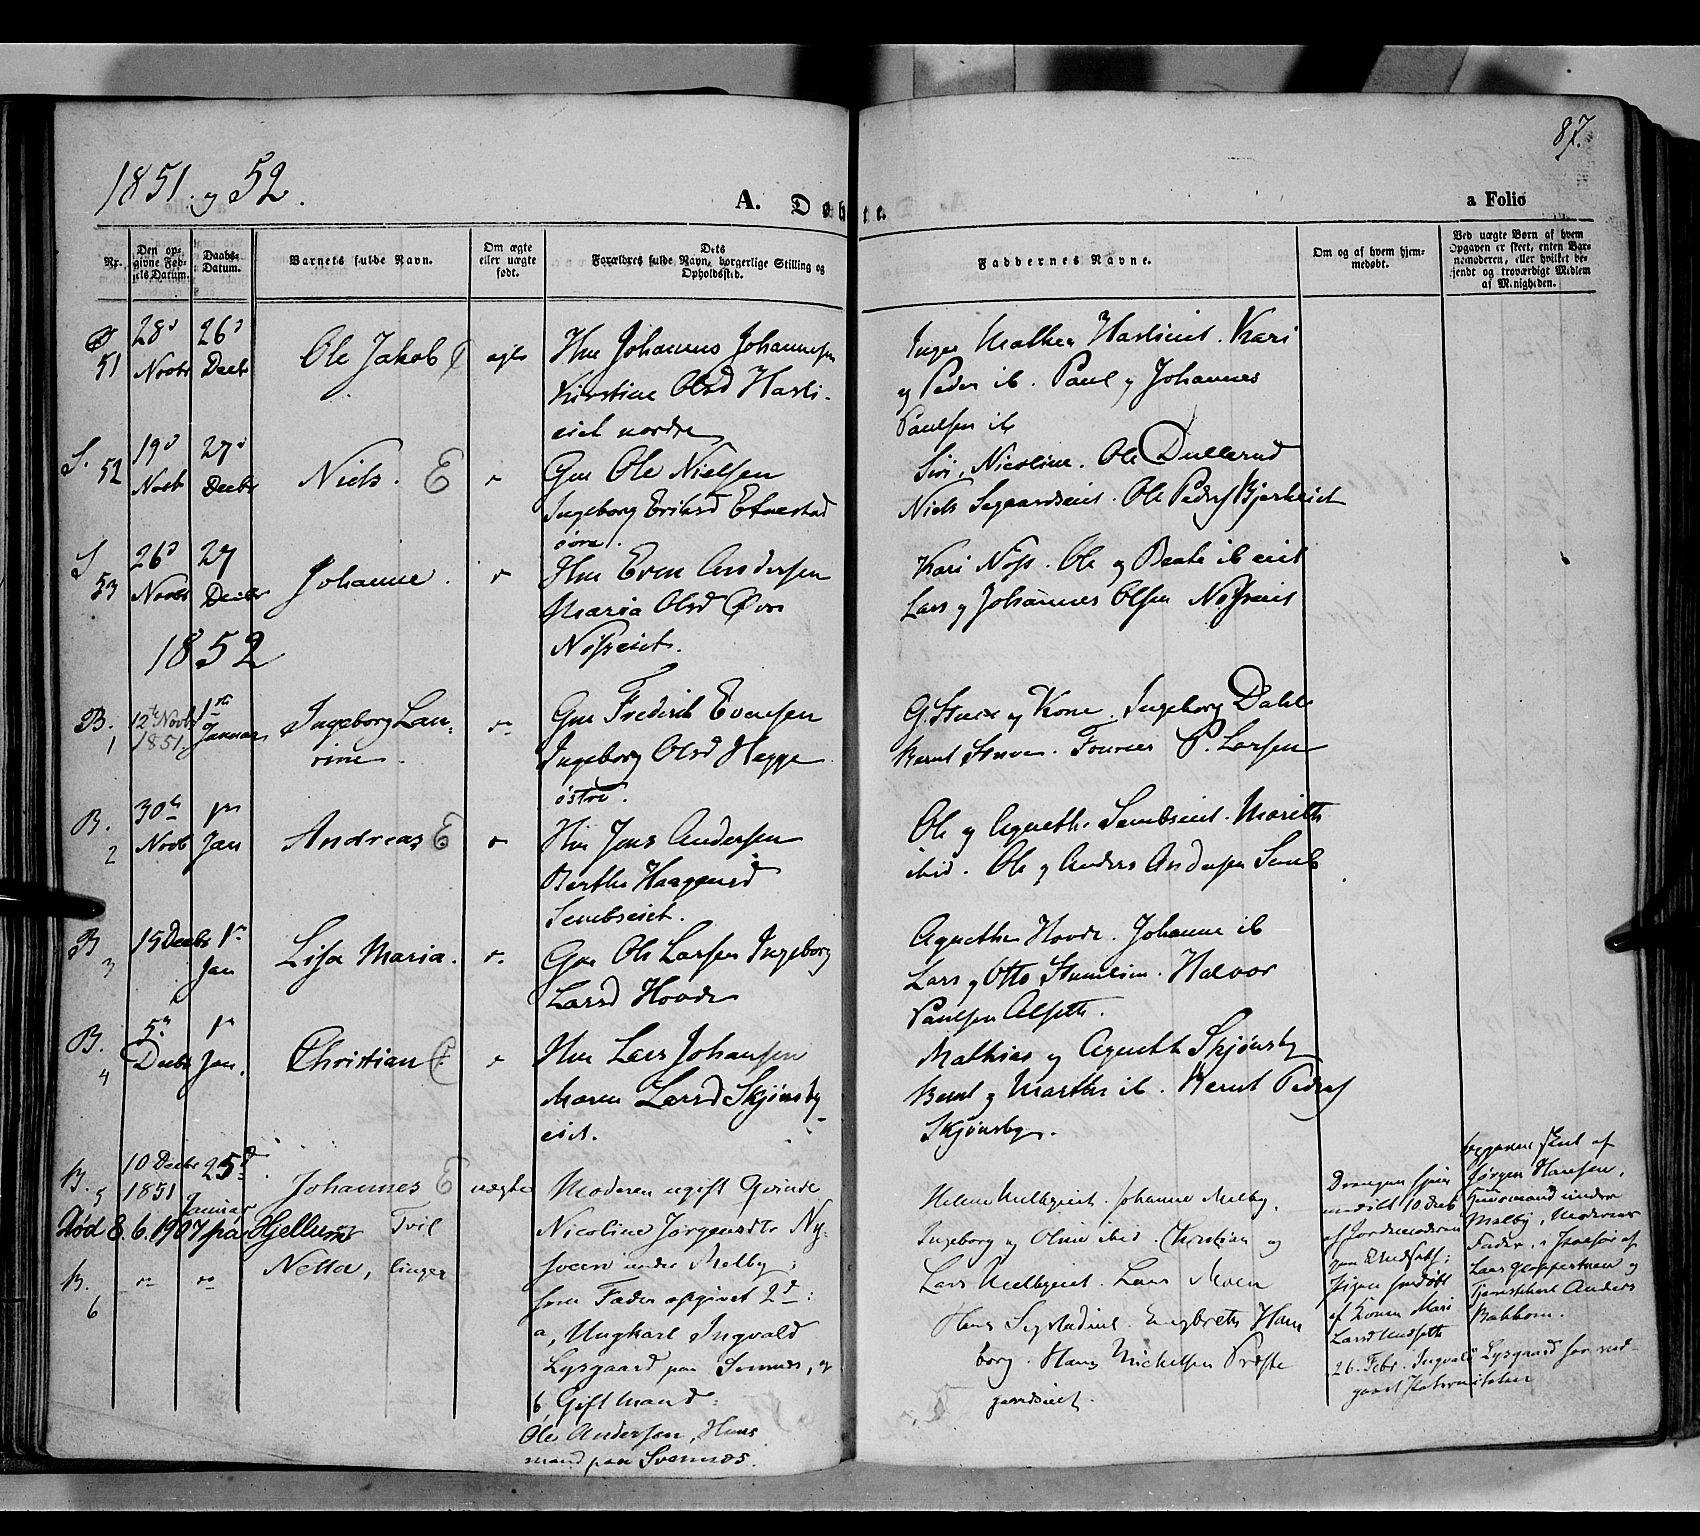 SAH, Biri prestekontor, Ministerialbok nr. 5, 1843-1854, s. 87